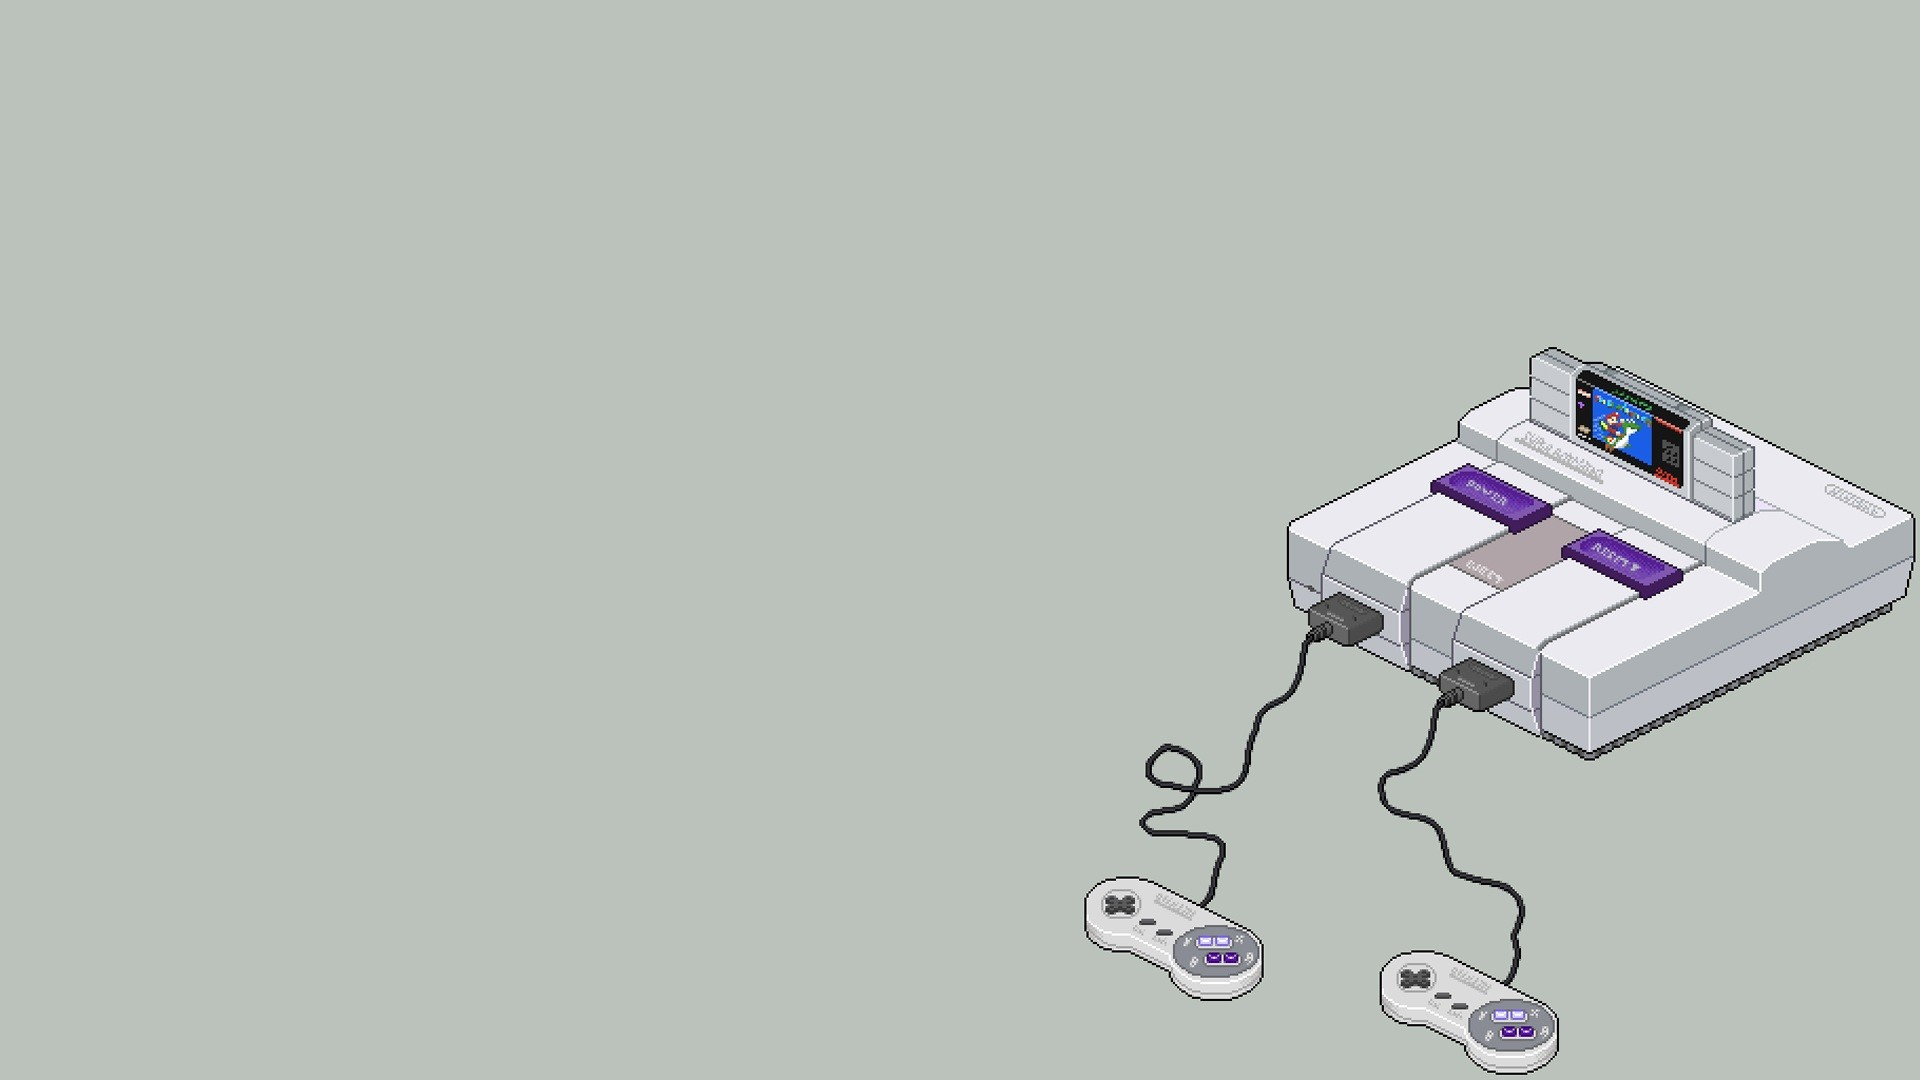 Res: 1920x1080, Download Original Wallpaper Category:games ...